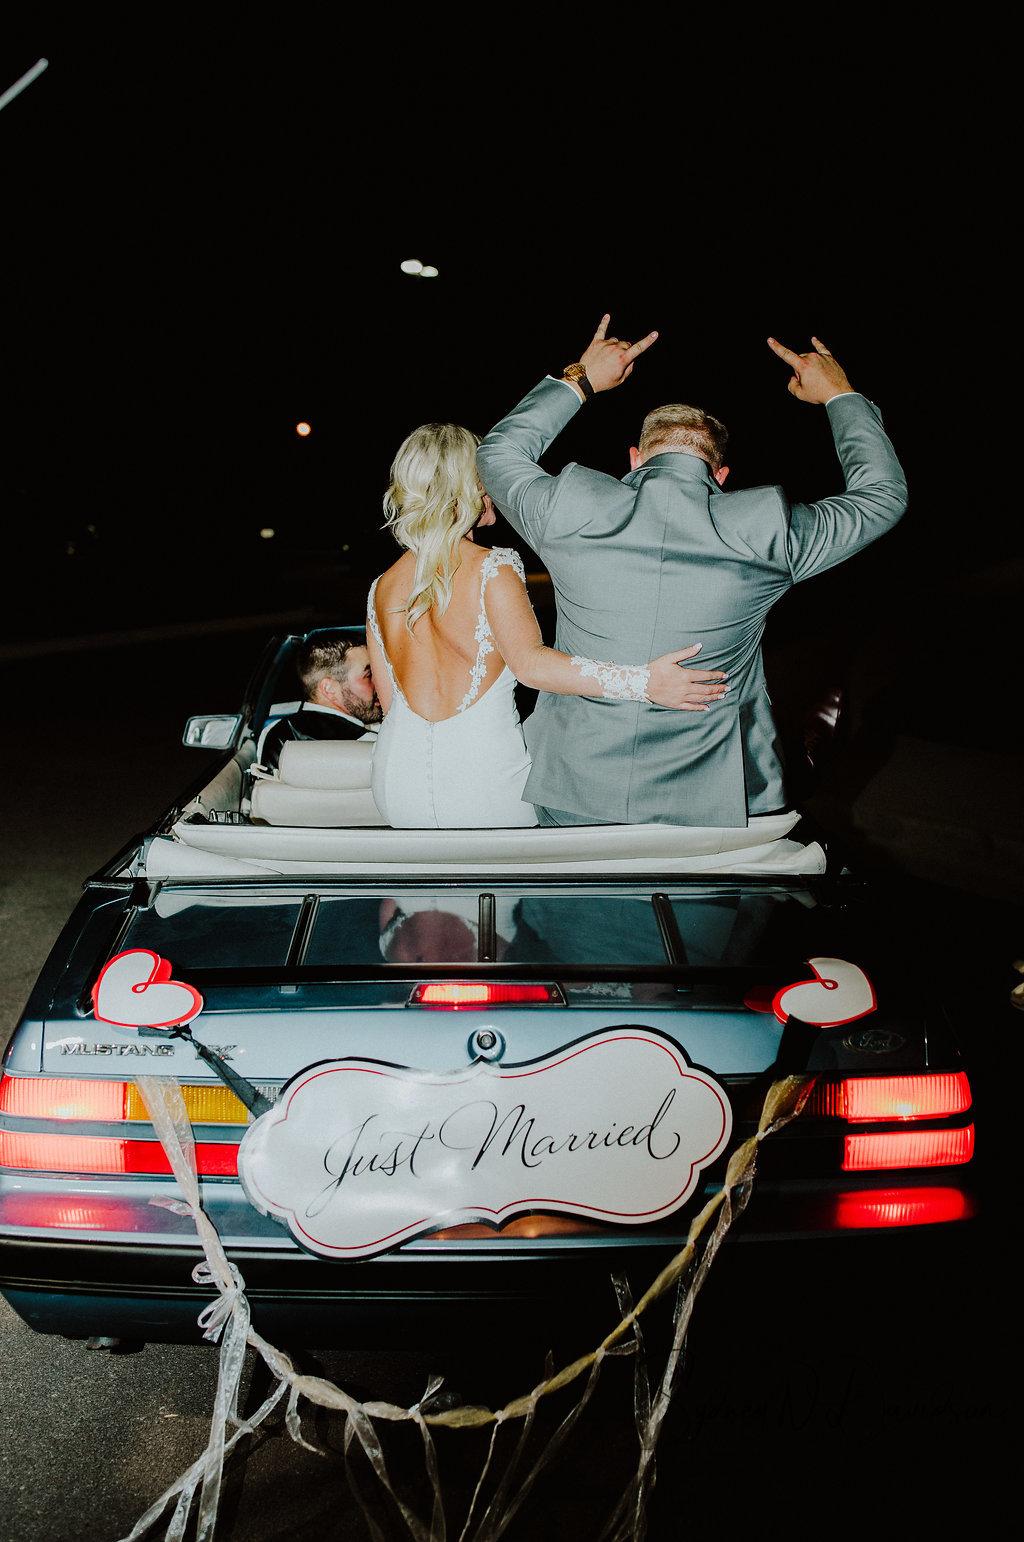 sydney-davidson-wedding-stillwater-oklahoma-wedding-session-traveling-photographer-portrait-tulsa-oklahoma-4780.jpg